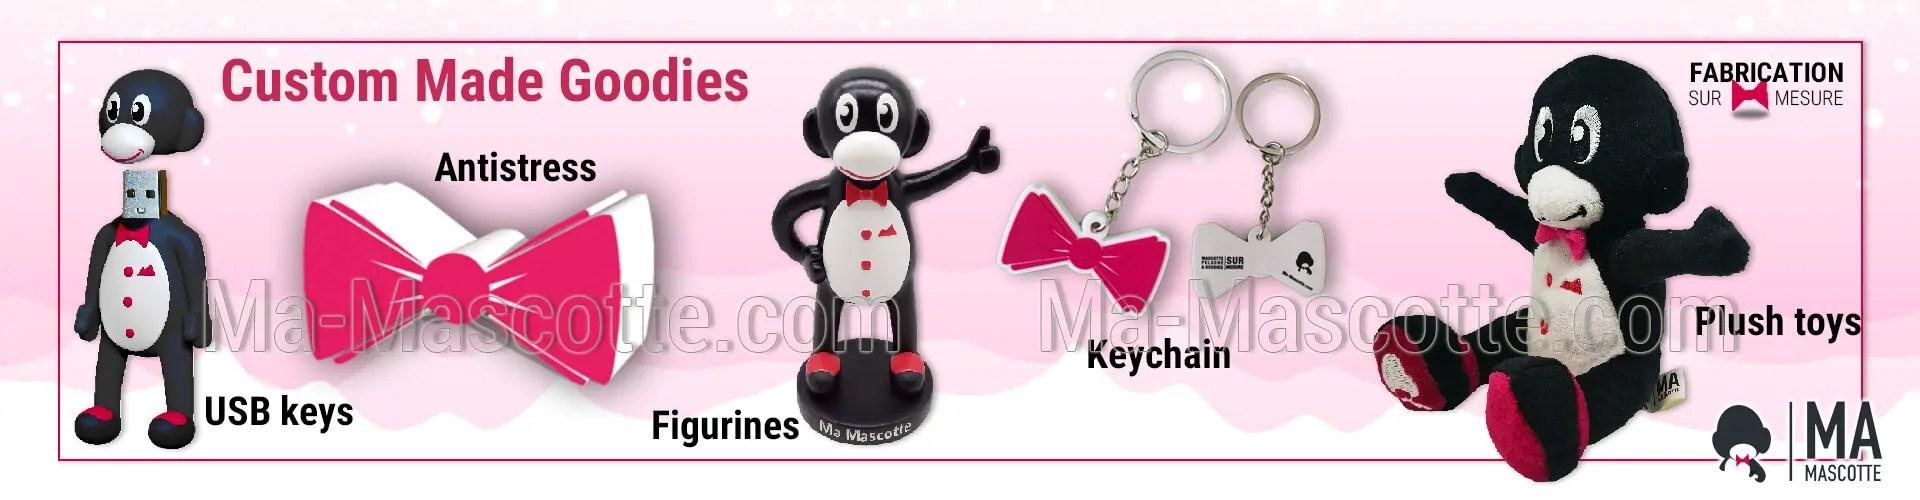 Custom made goodies. Custom-made promotional items: plush, figurine, keychain, anti-stress, USB keys, statue.